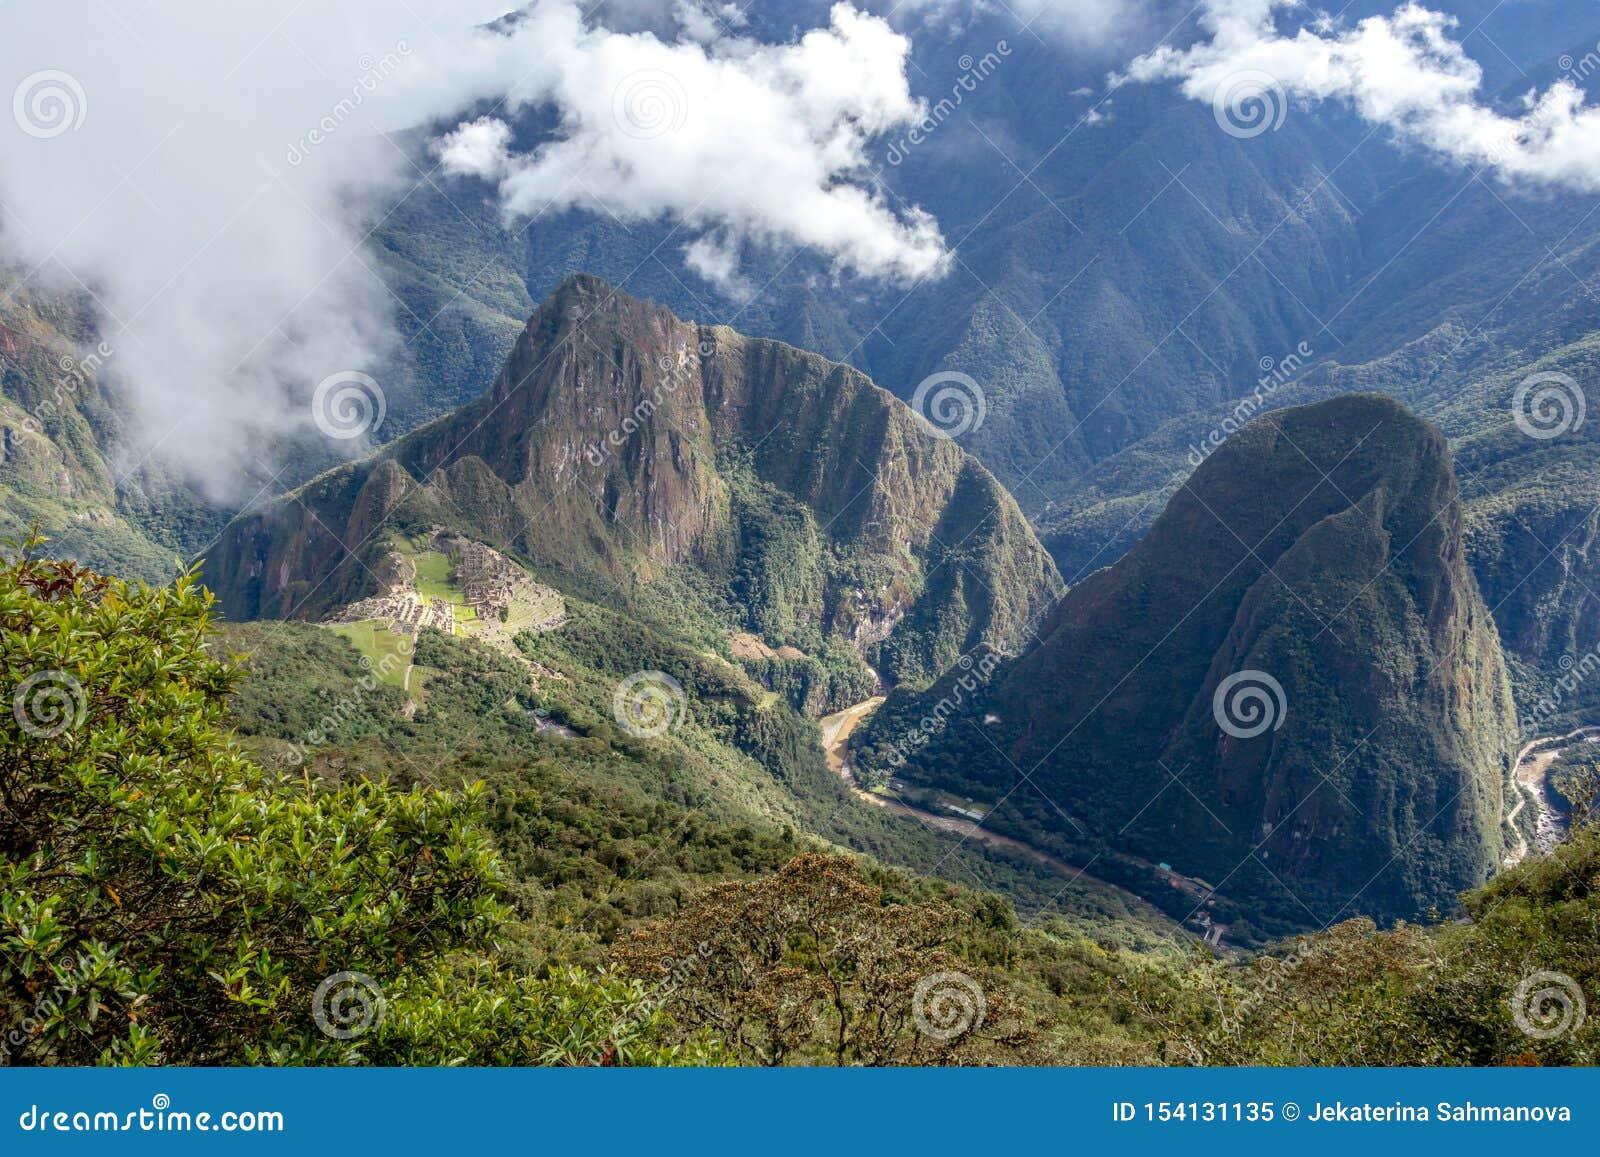 Huayna Picchu, or Wayna Pikchu, mountain in clouds rises over Machu Picchu Inca citadel, lost city of the Incas